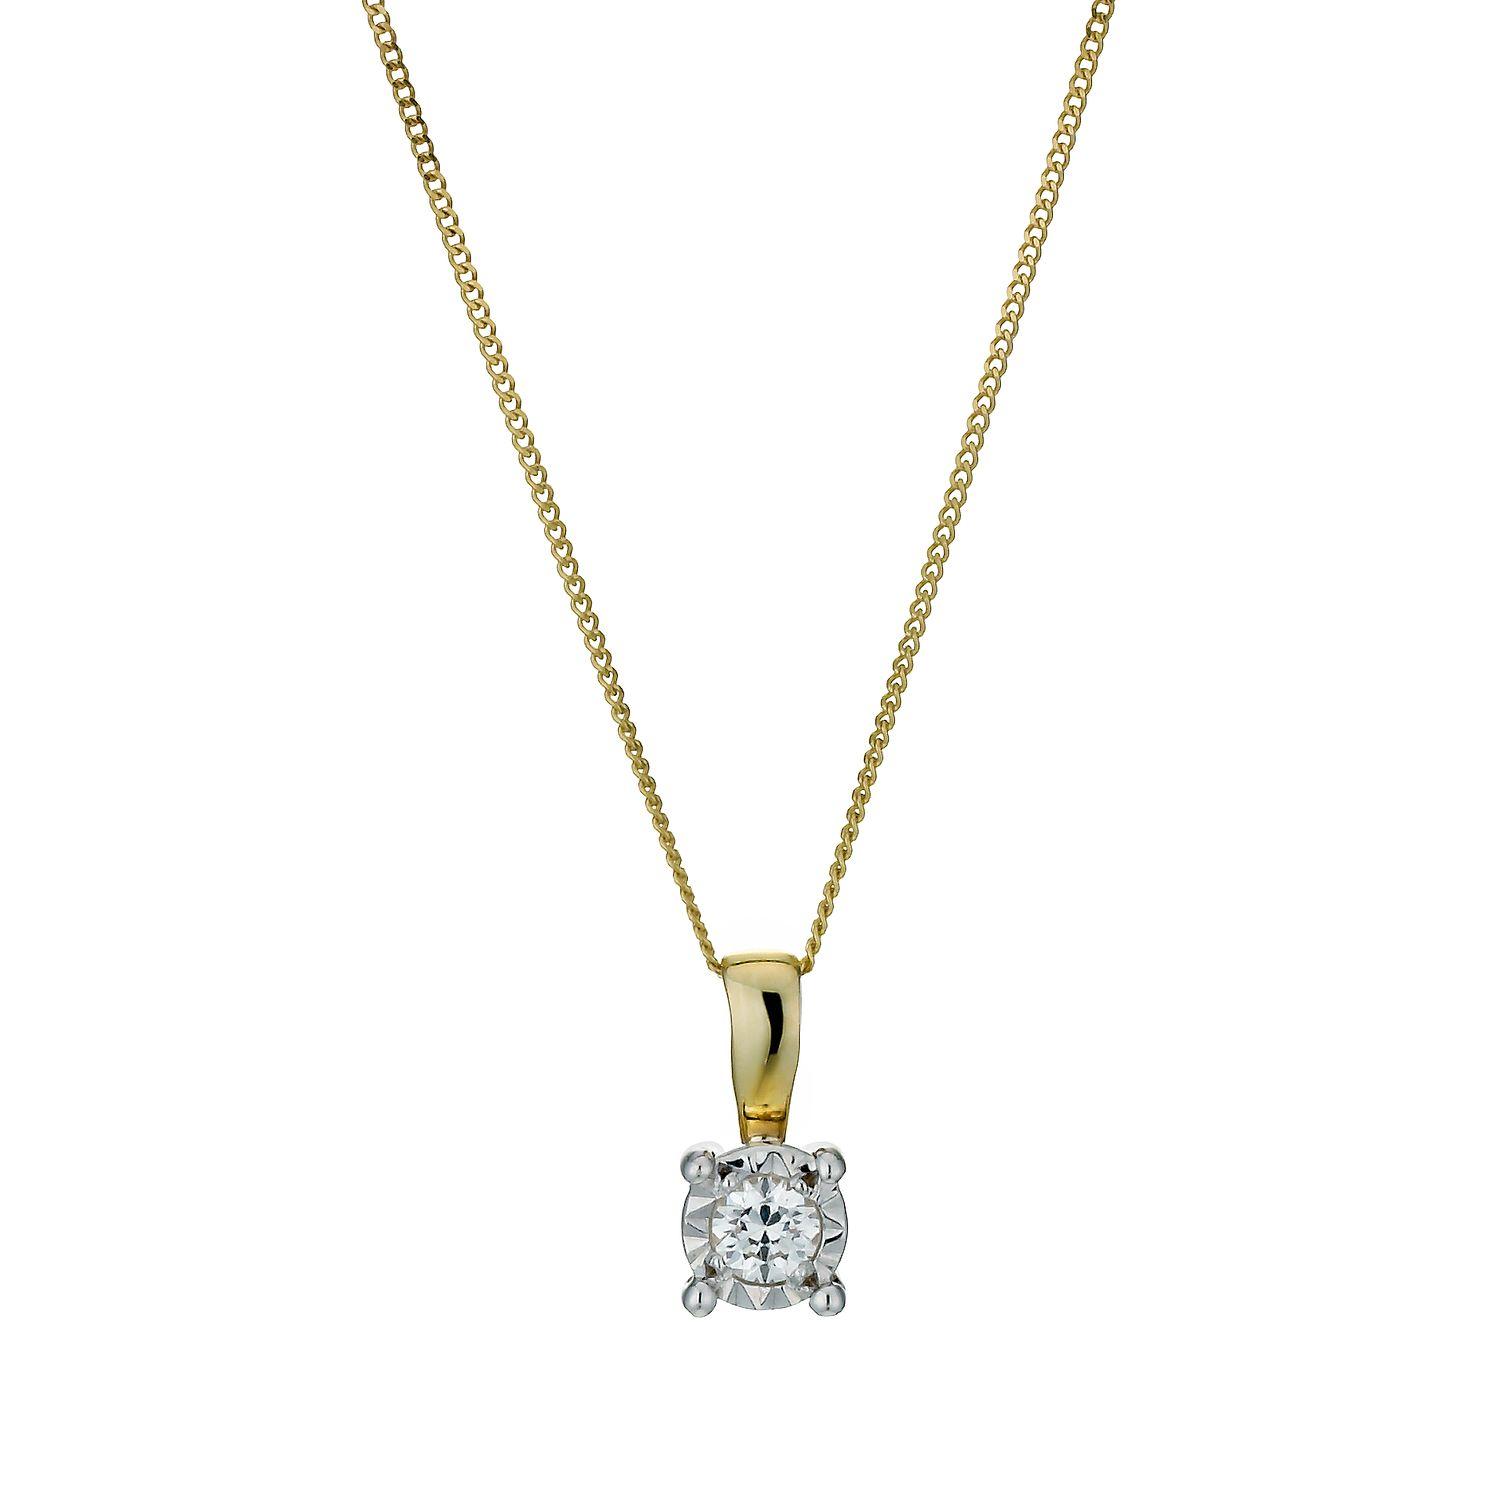 Solitaire diamond necklaces hmuel 9ct gold illusion diamond pendant necklace product number 1021028 aloadofball Images